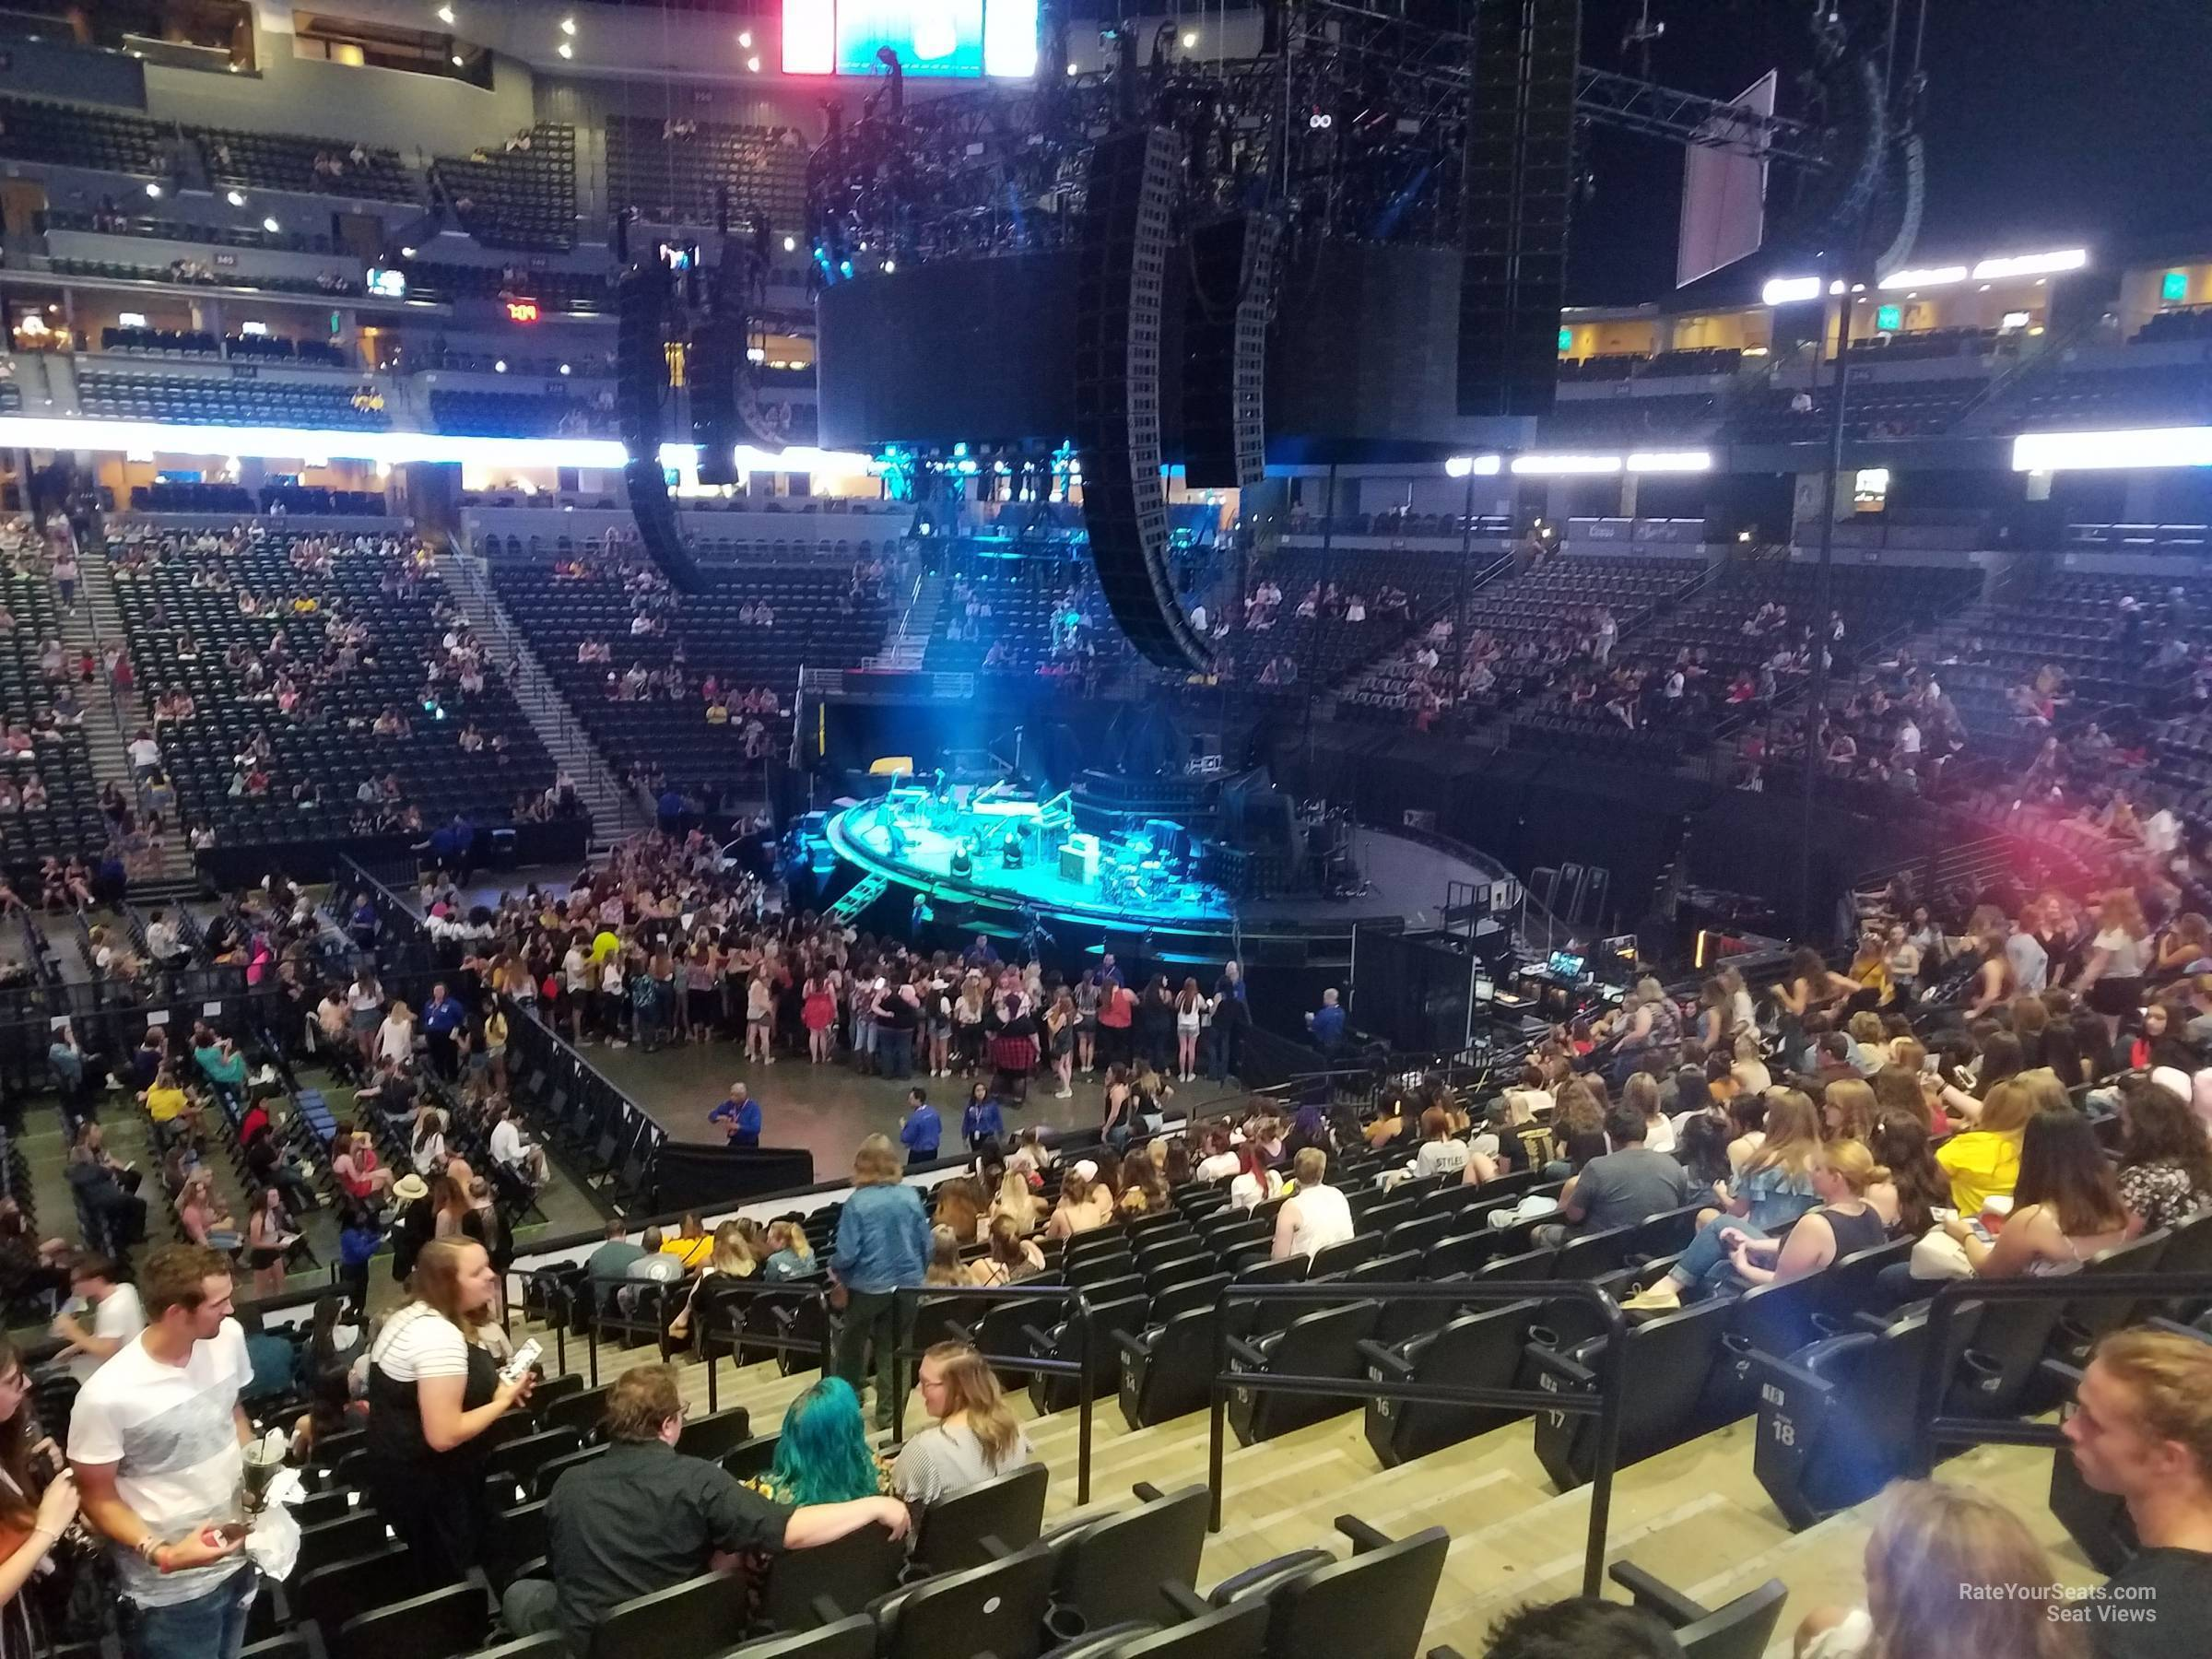 Pepsi Center Section 148 Concert Seating Rateyourseatscom